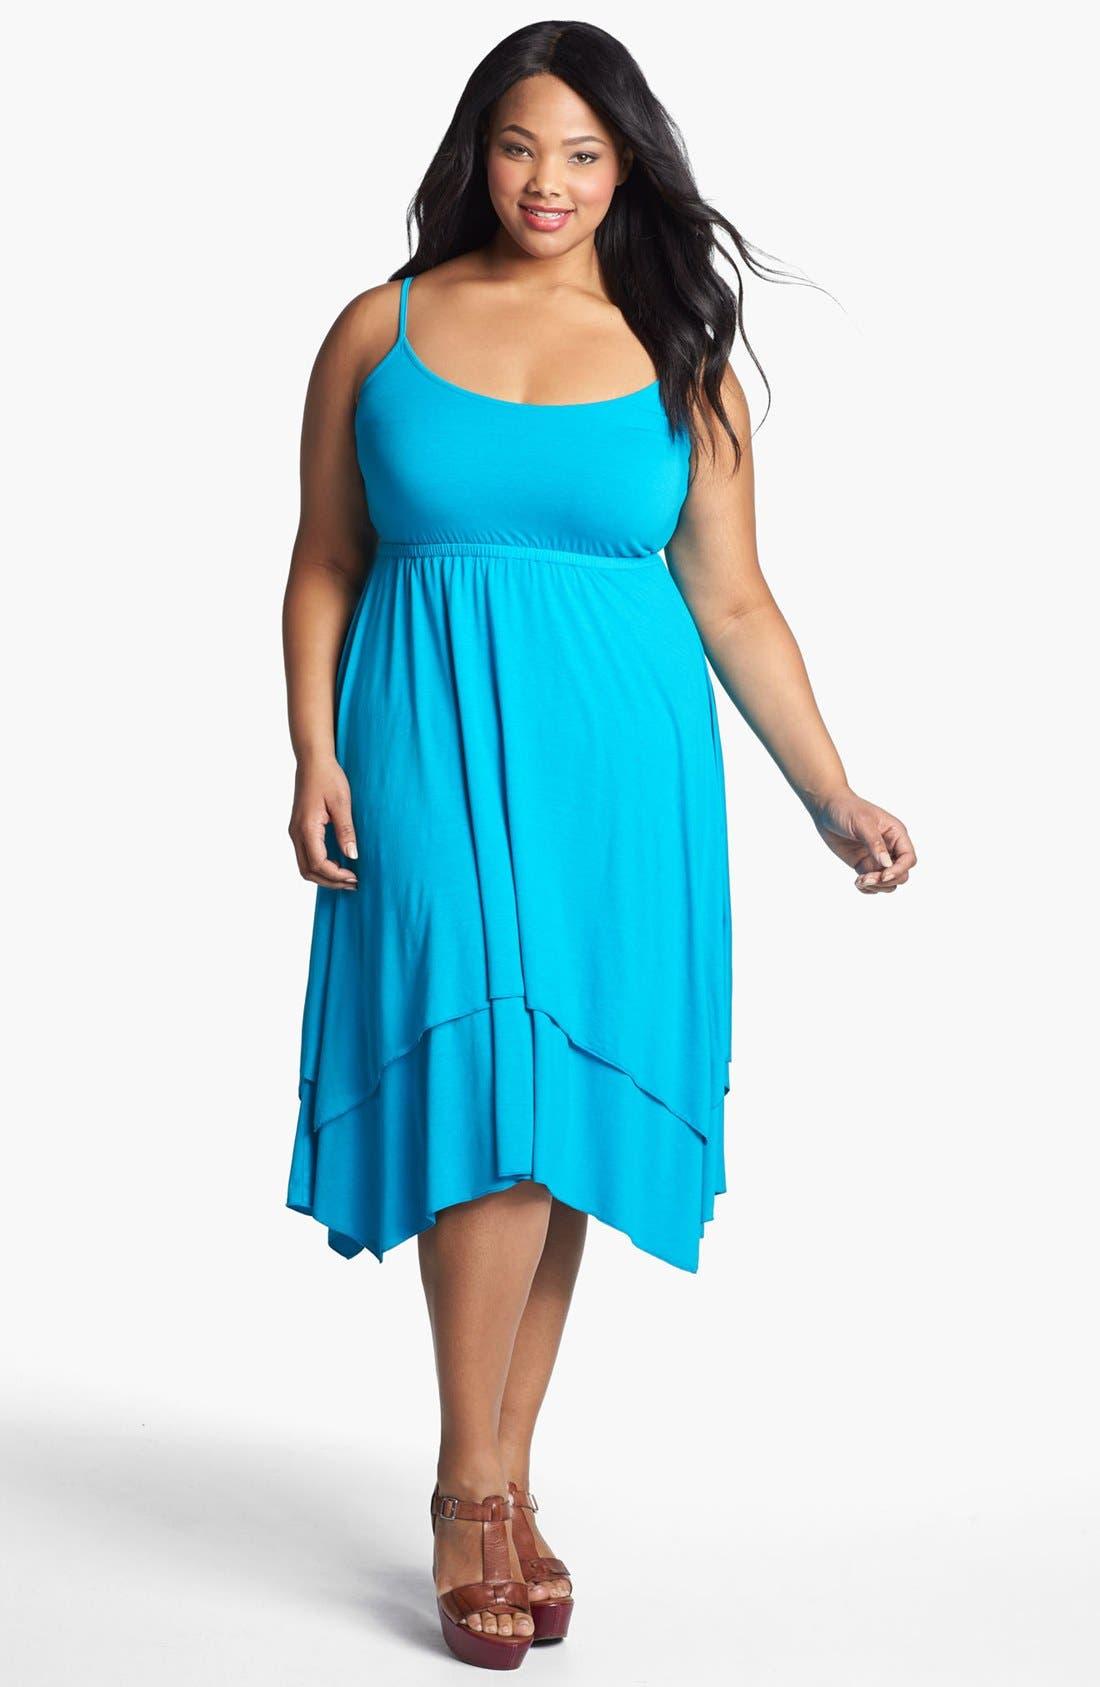 Alternate Image 1 Selected - Three Dots Layered Skirt Sundress (Plus Size)